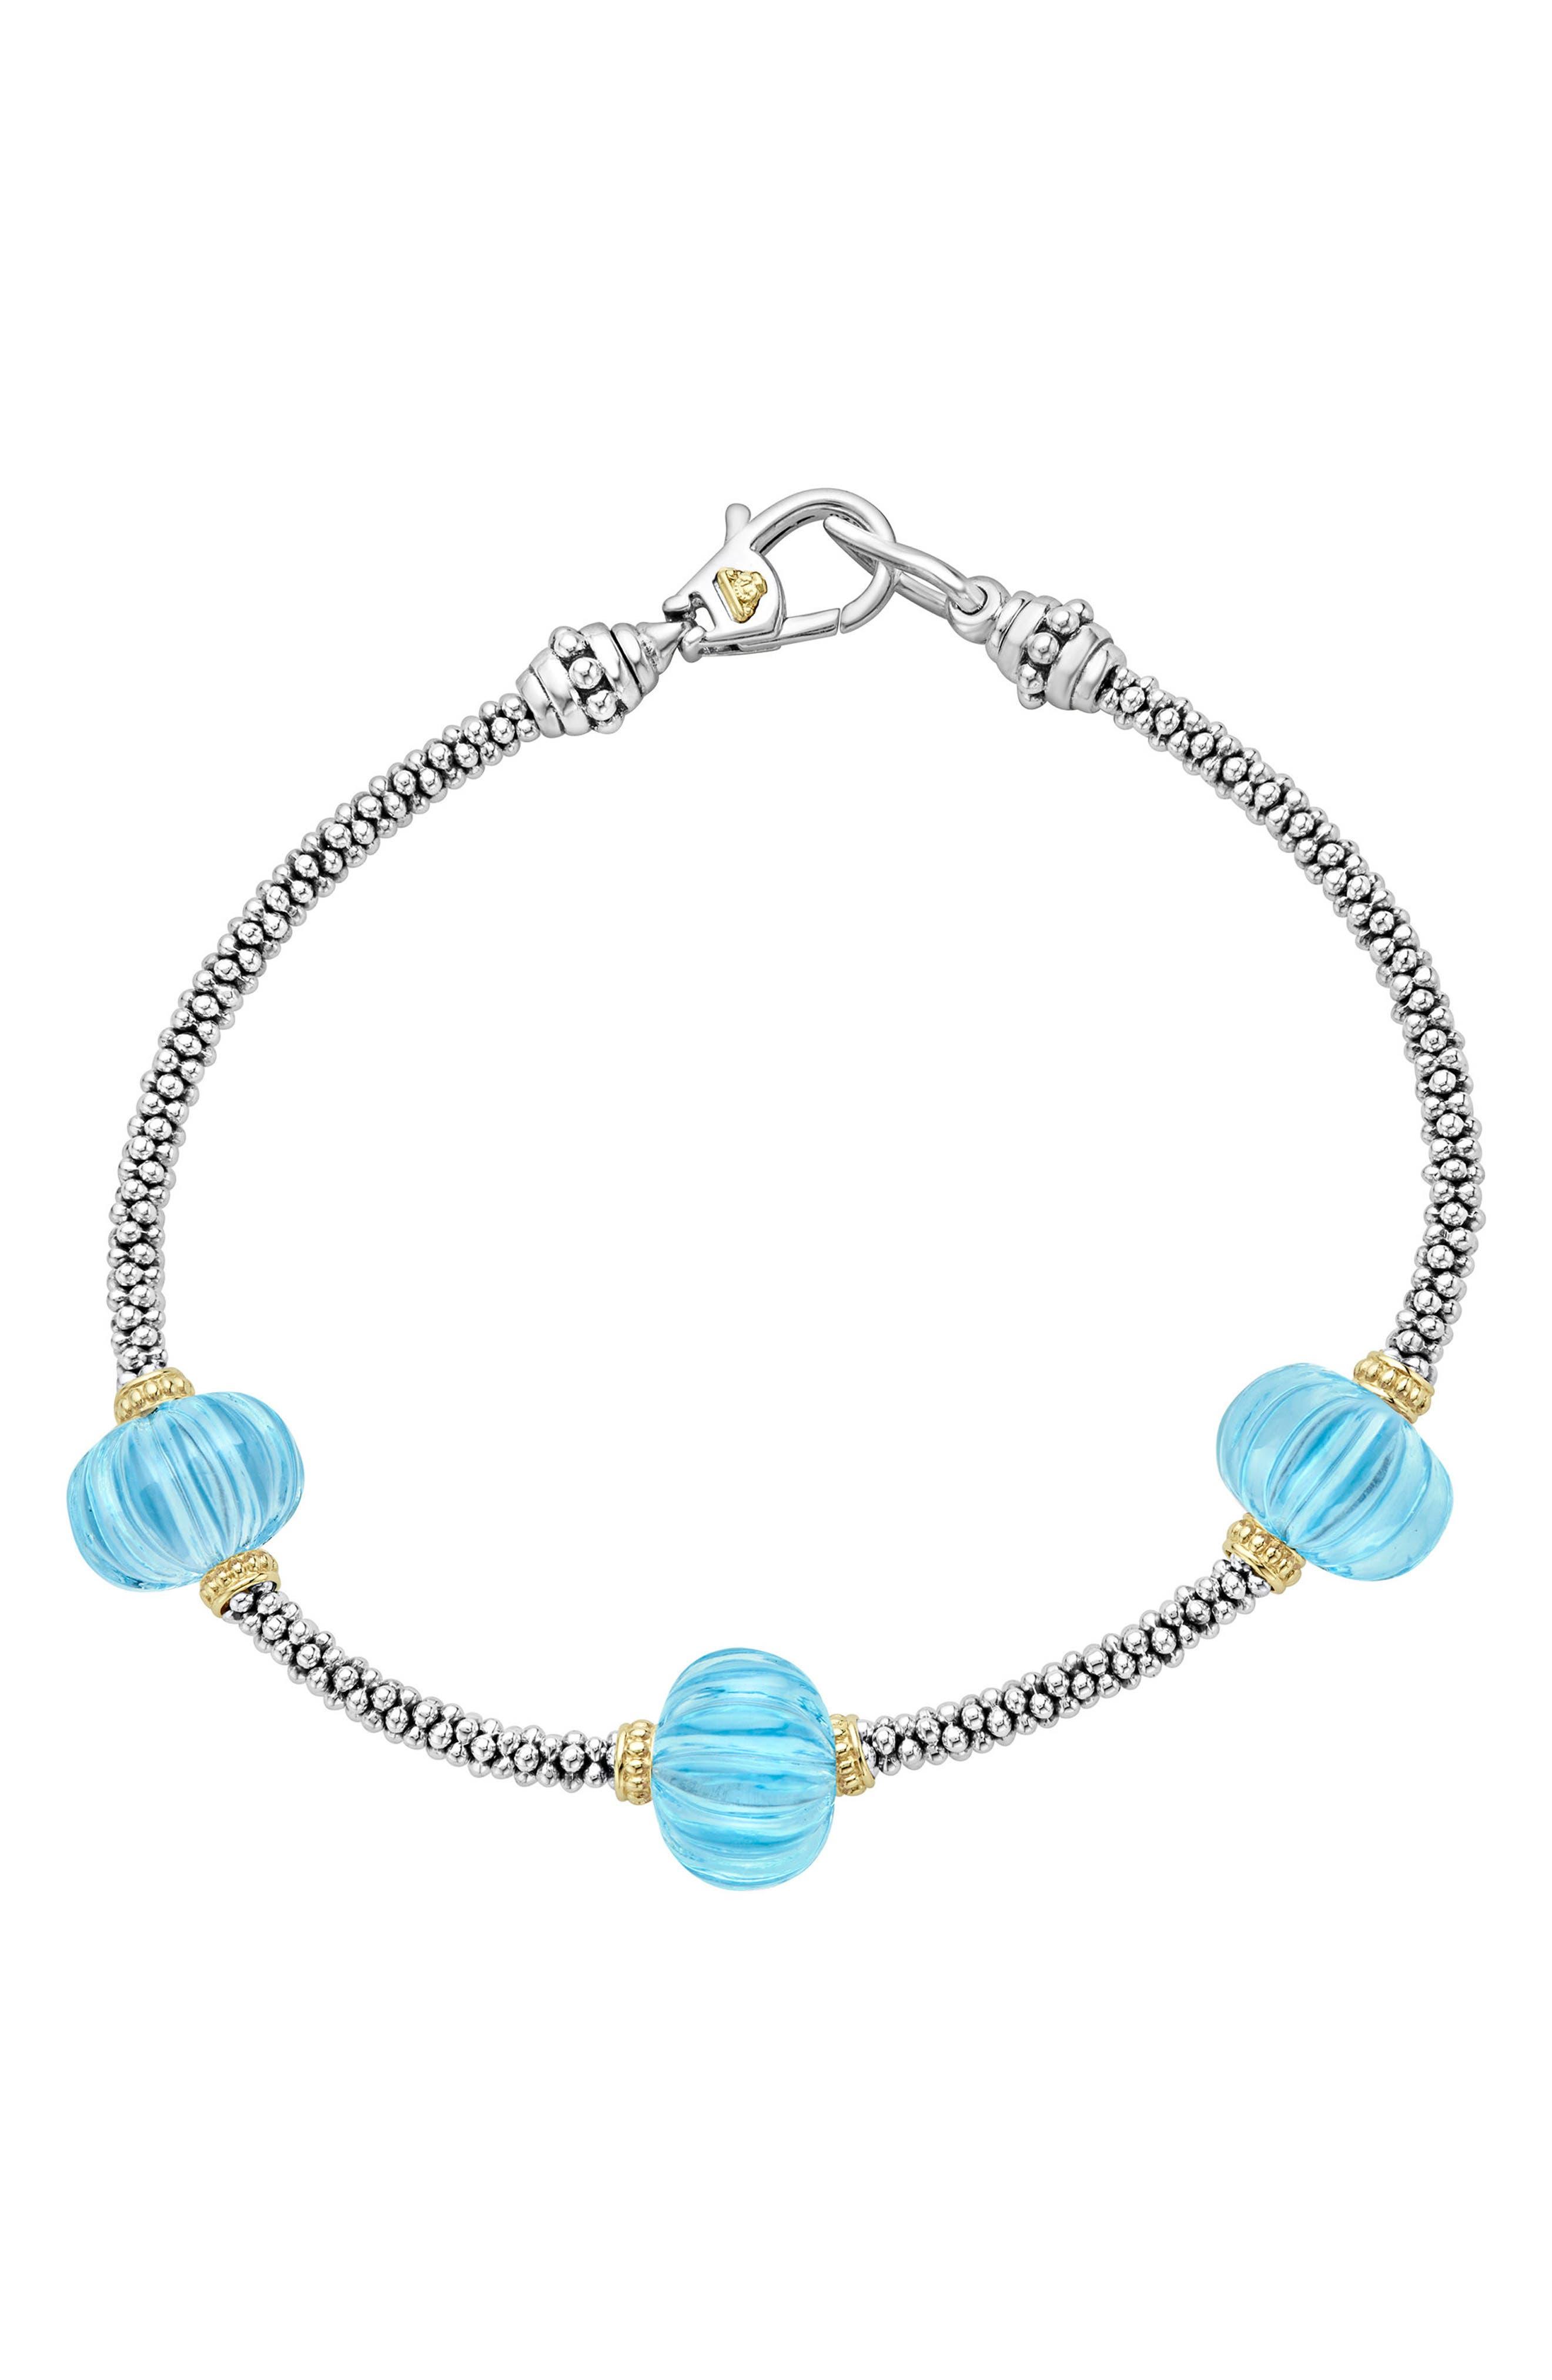 Caviar Forever Melon Bead Station Bracelet,                         Main,                         color, SILVER/ SKY BLUE TOPAZ